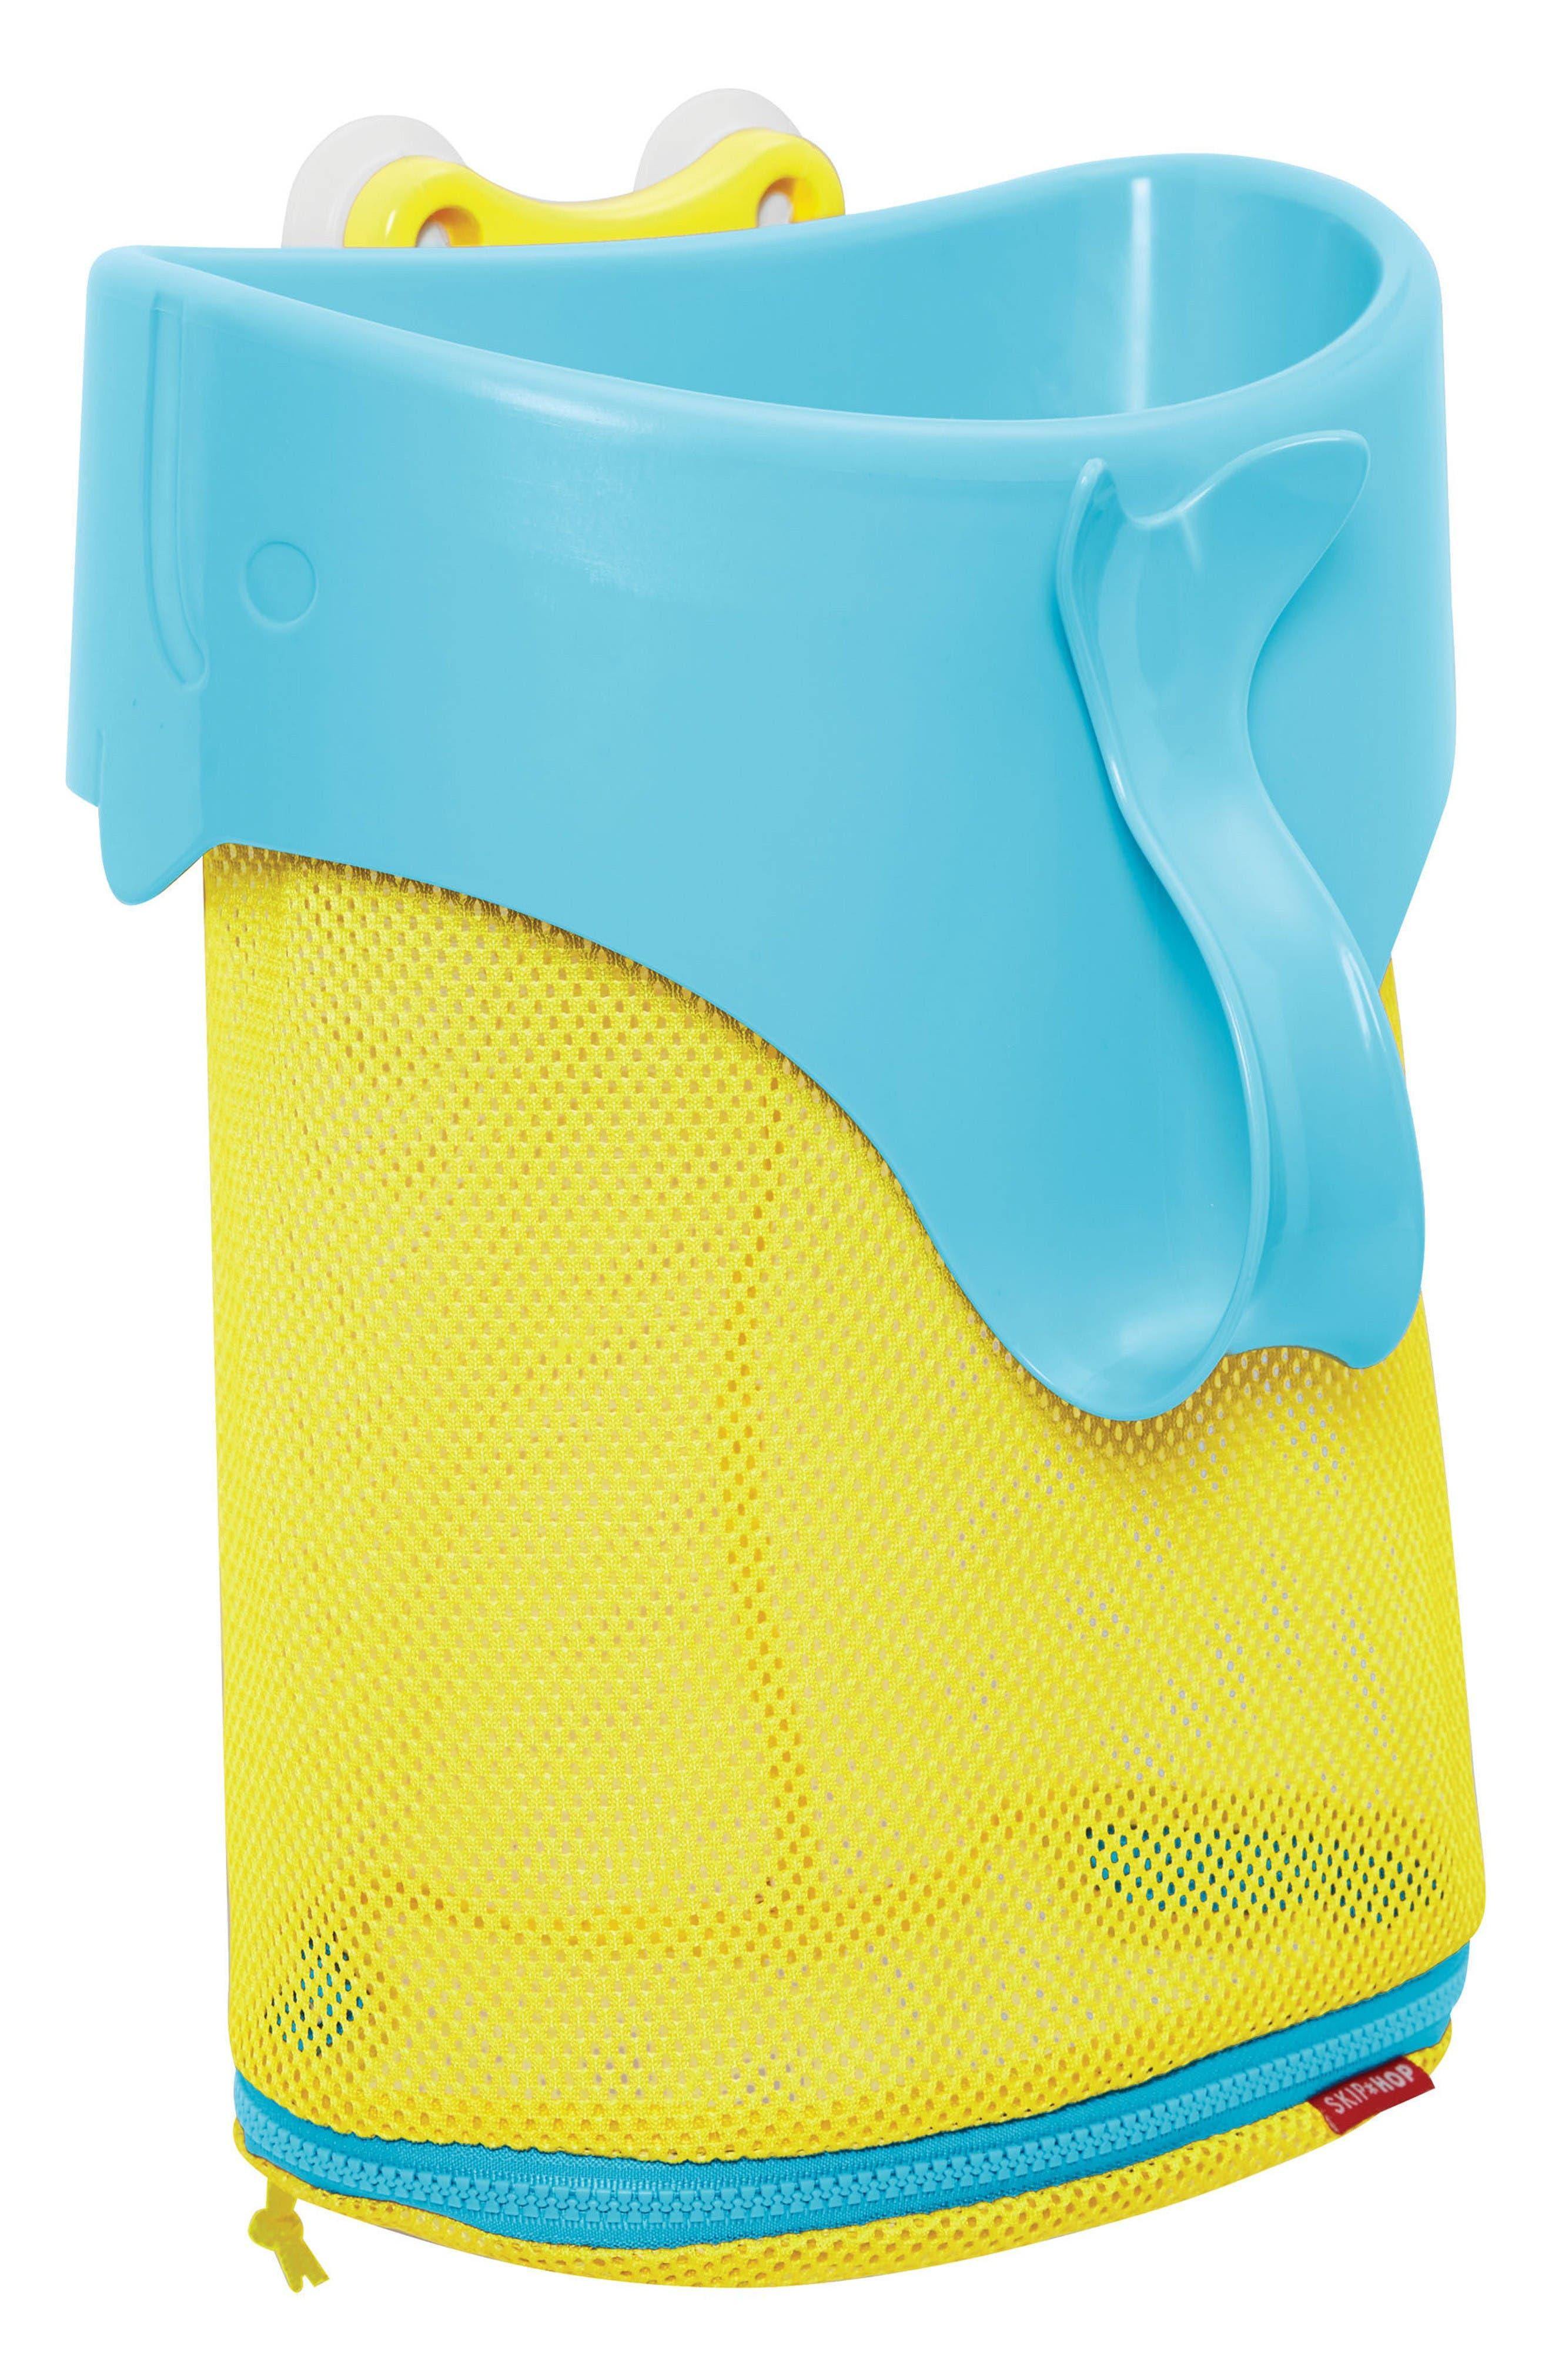 Moby Scoop & Splash Bath Toy Organizer,                         Main,                         color, Moby